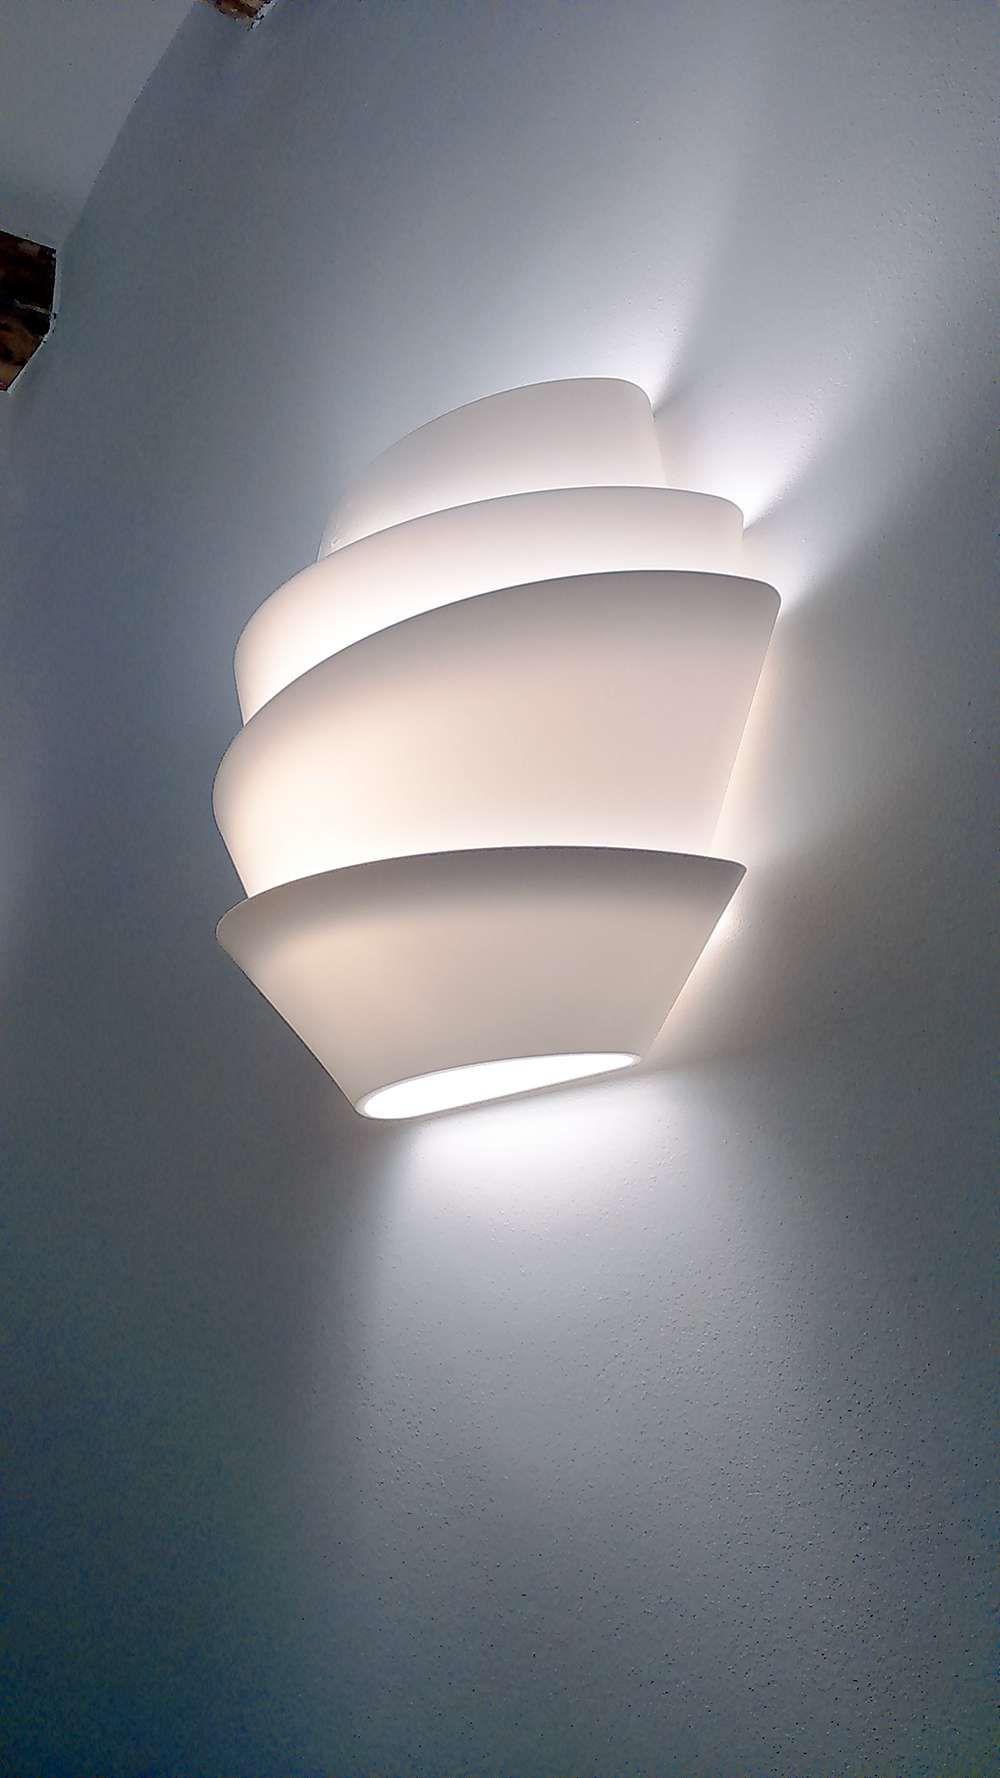 reformas_integrales_viviendas_iluminacion_apliques